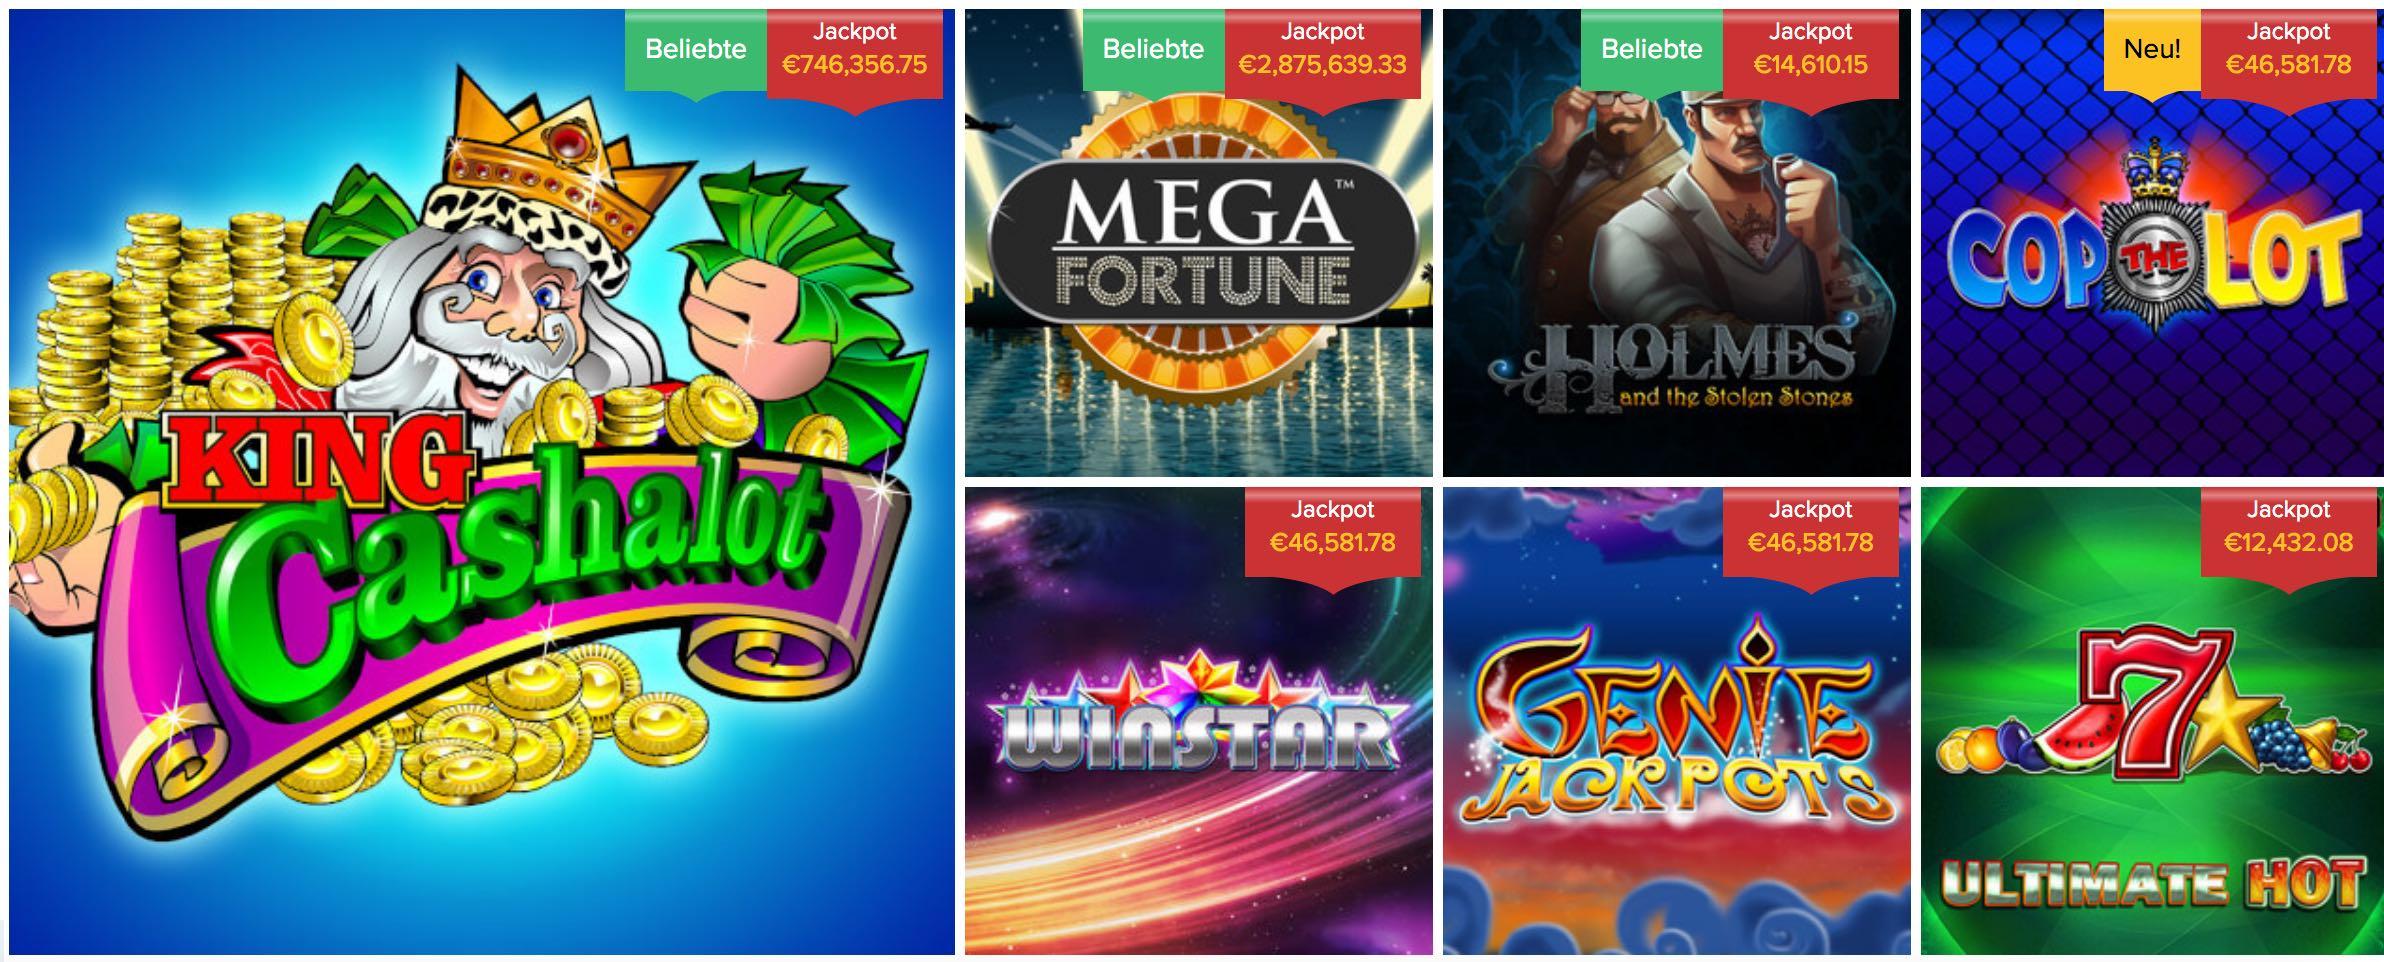 Progressive Jackpot Slot Spiele